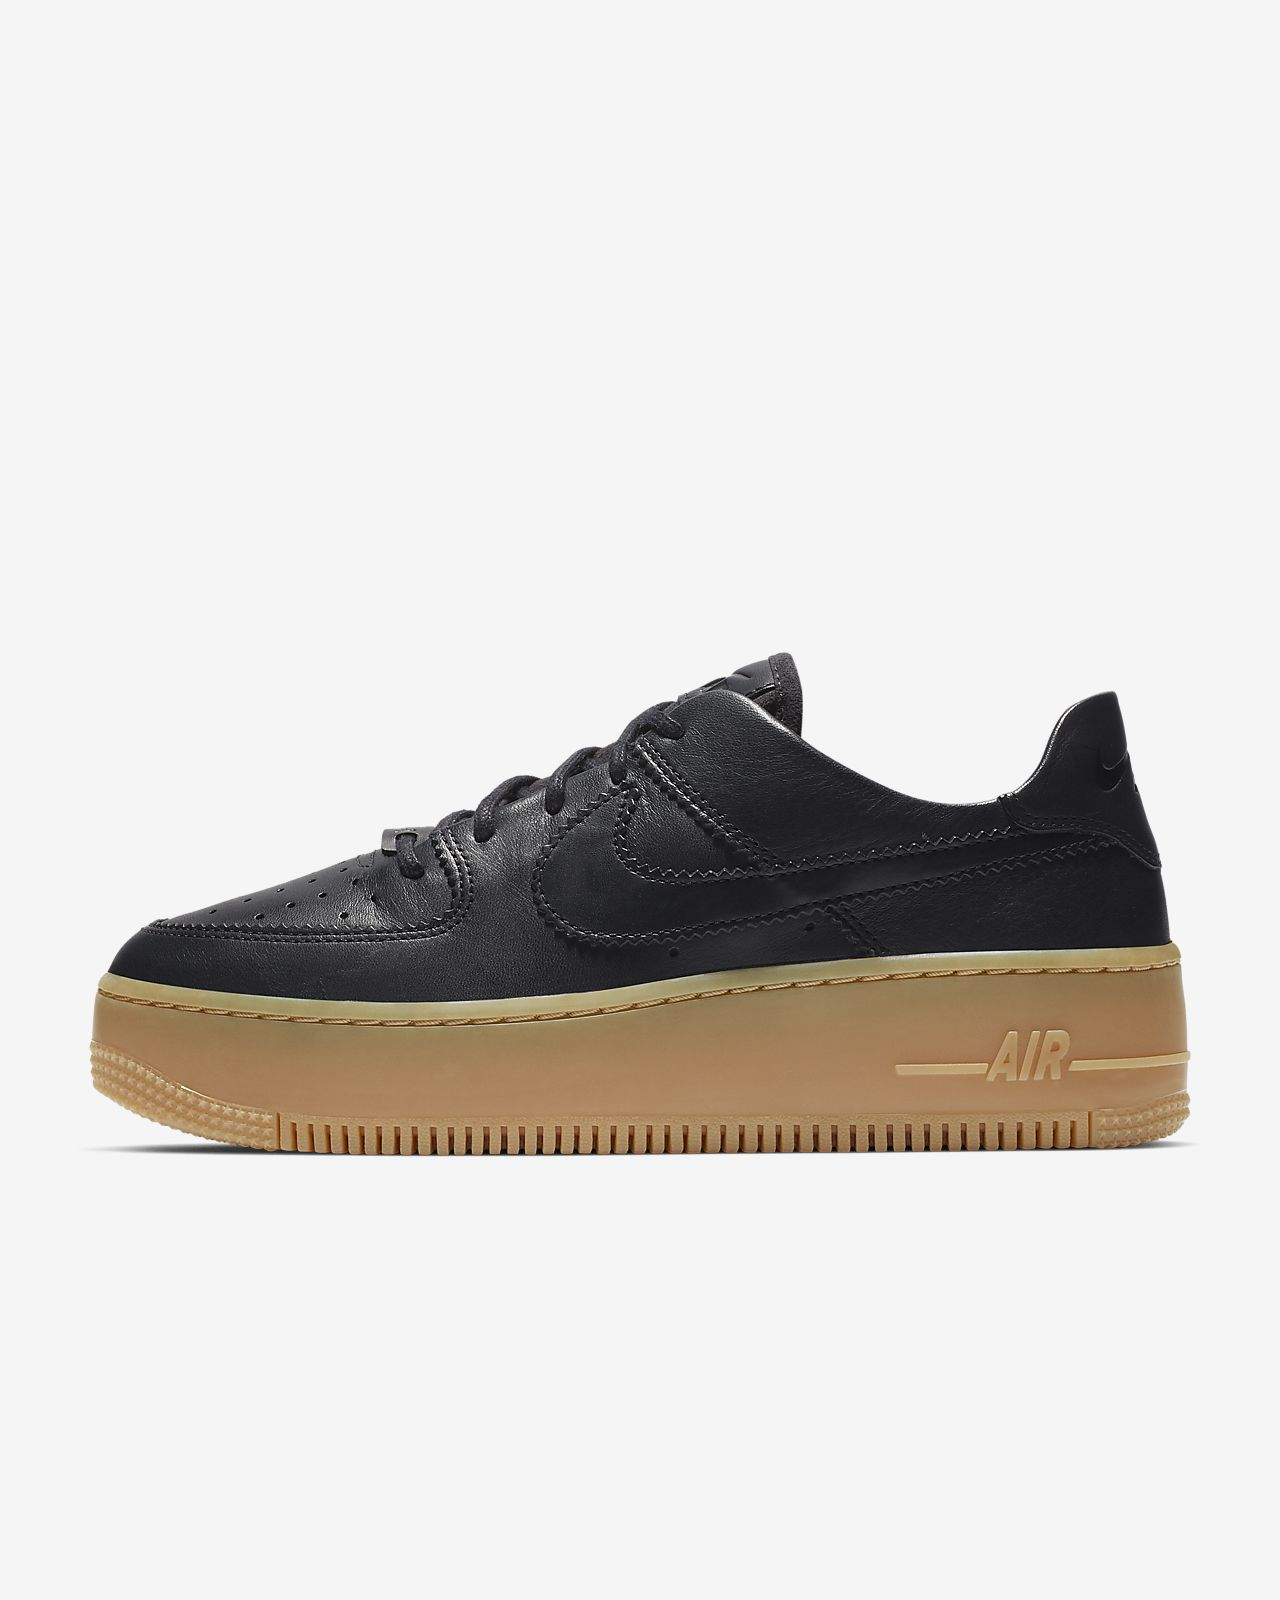 Sko Nike Air Force 1 Sage Low LX för kvinnor